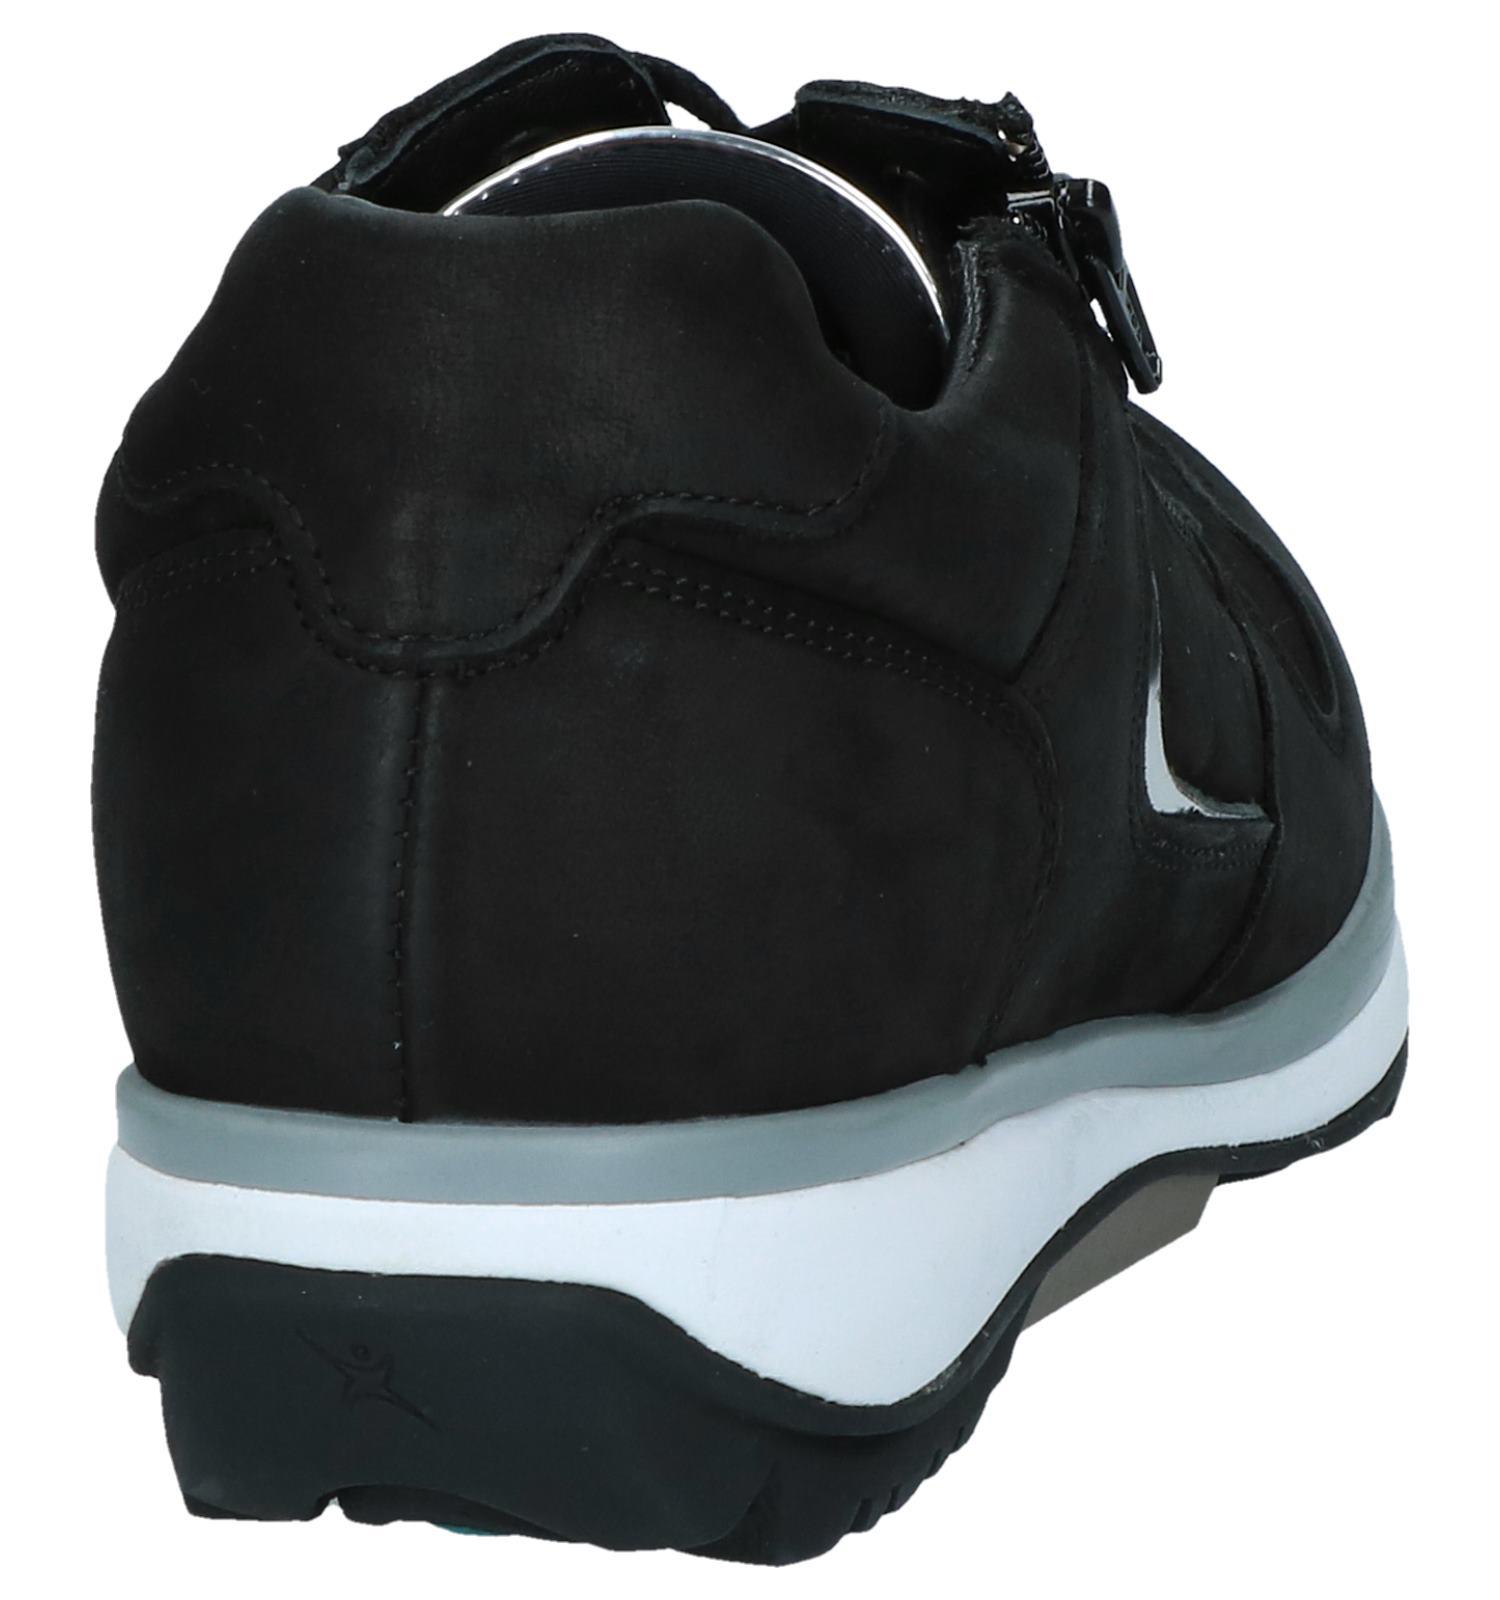 Zwarte Veterschoenen Jersey Gx Xsensible Stretchwalker jVpqSMLzGU